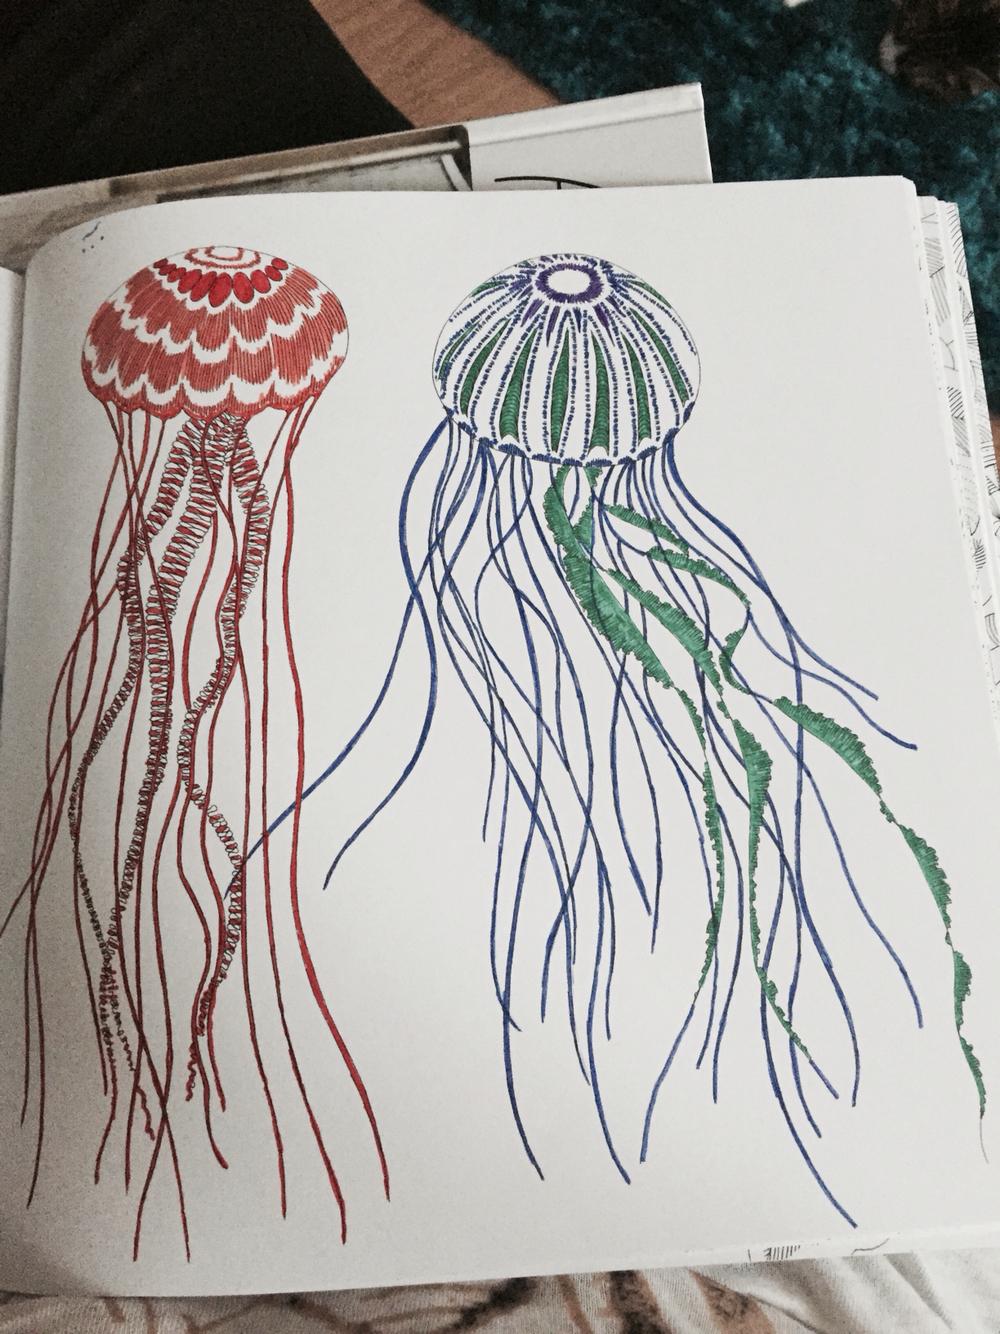 Drawn jellies millie marotta From Kingdom Jellyfish Animal Adult